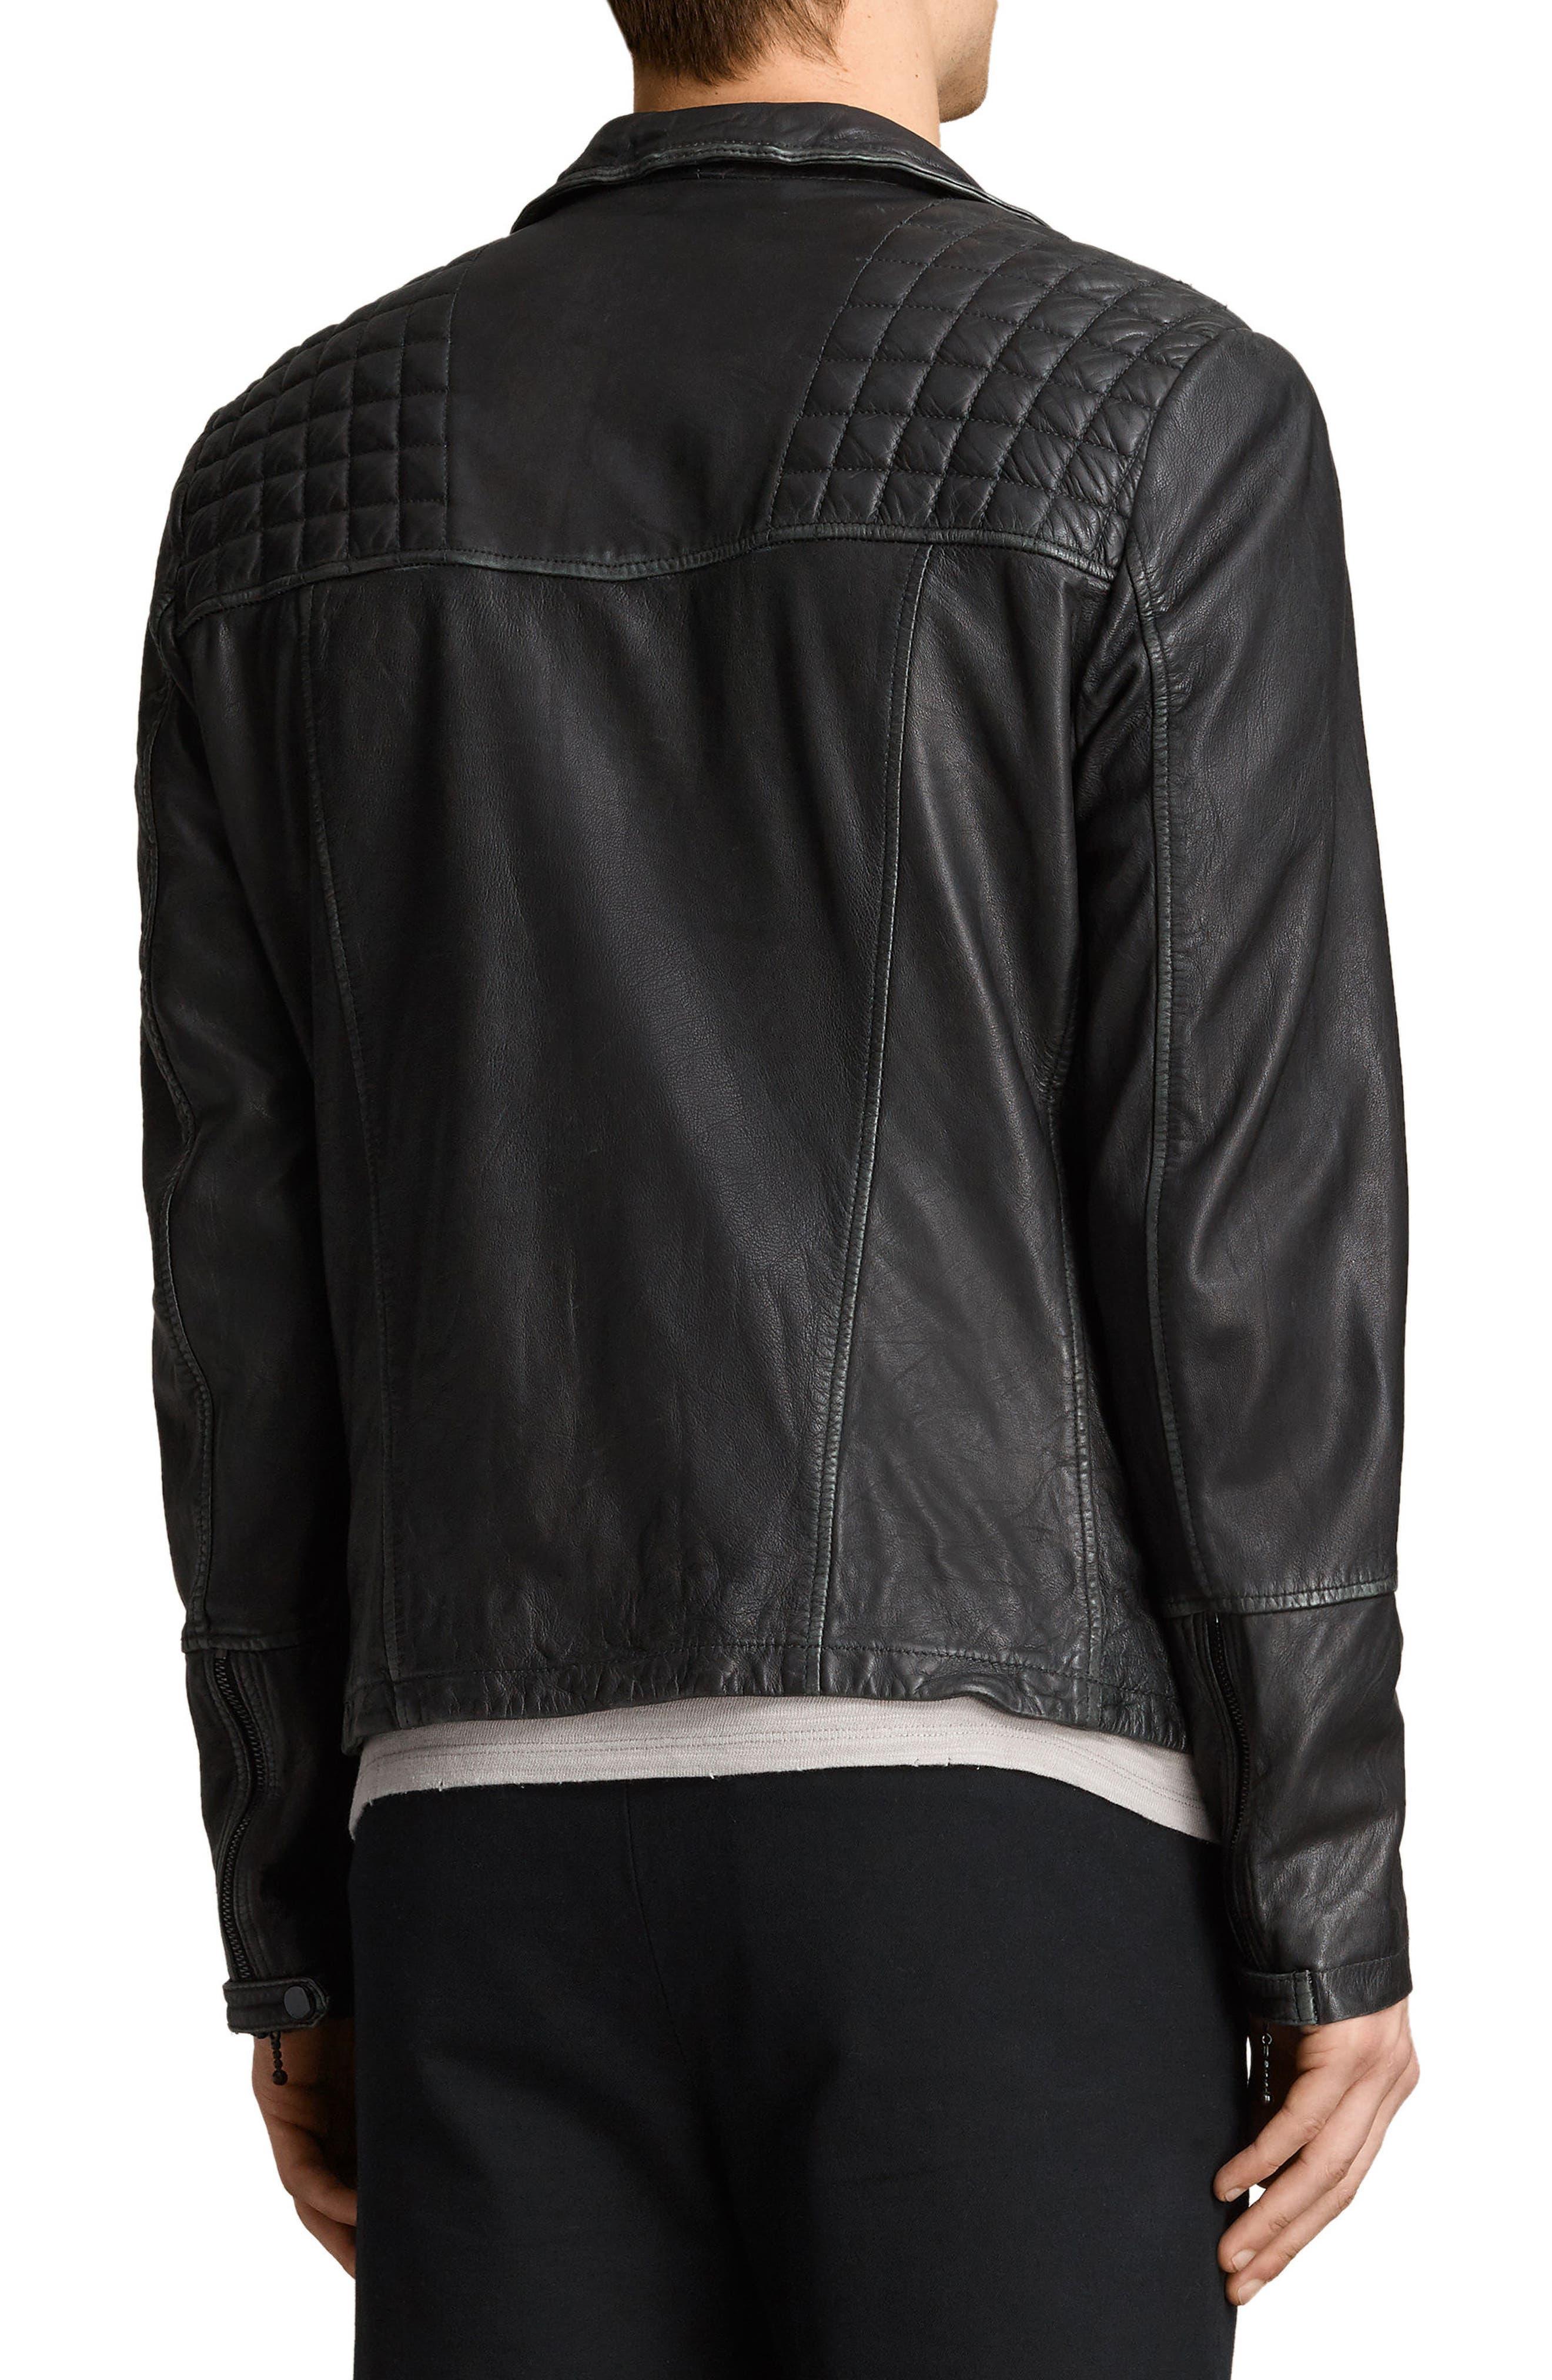 Cargo Biker Slim Fit Leather Jacket,                             Alternate thumbnail 2, color,                             BLACK GREY